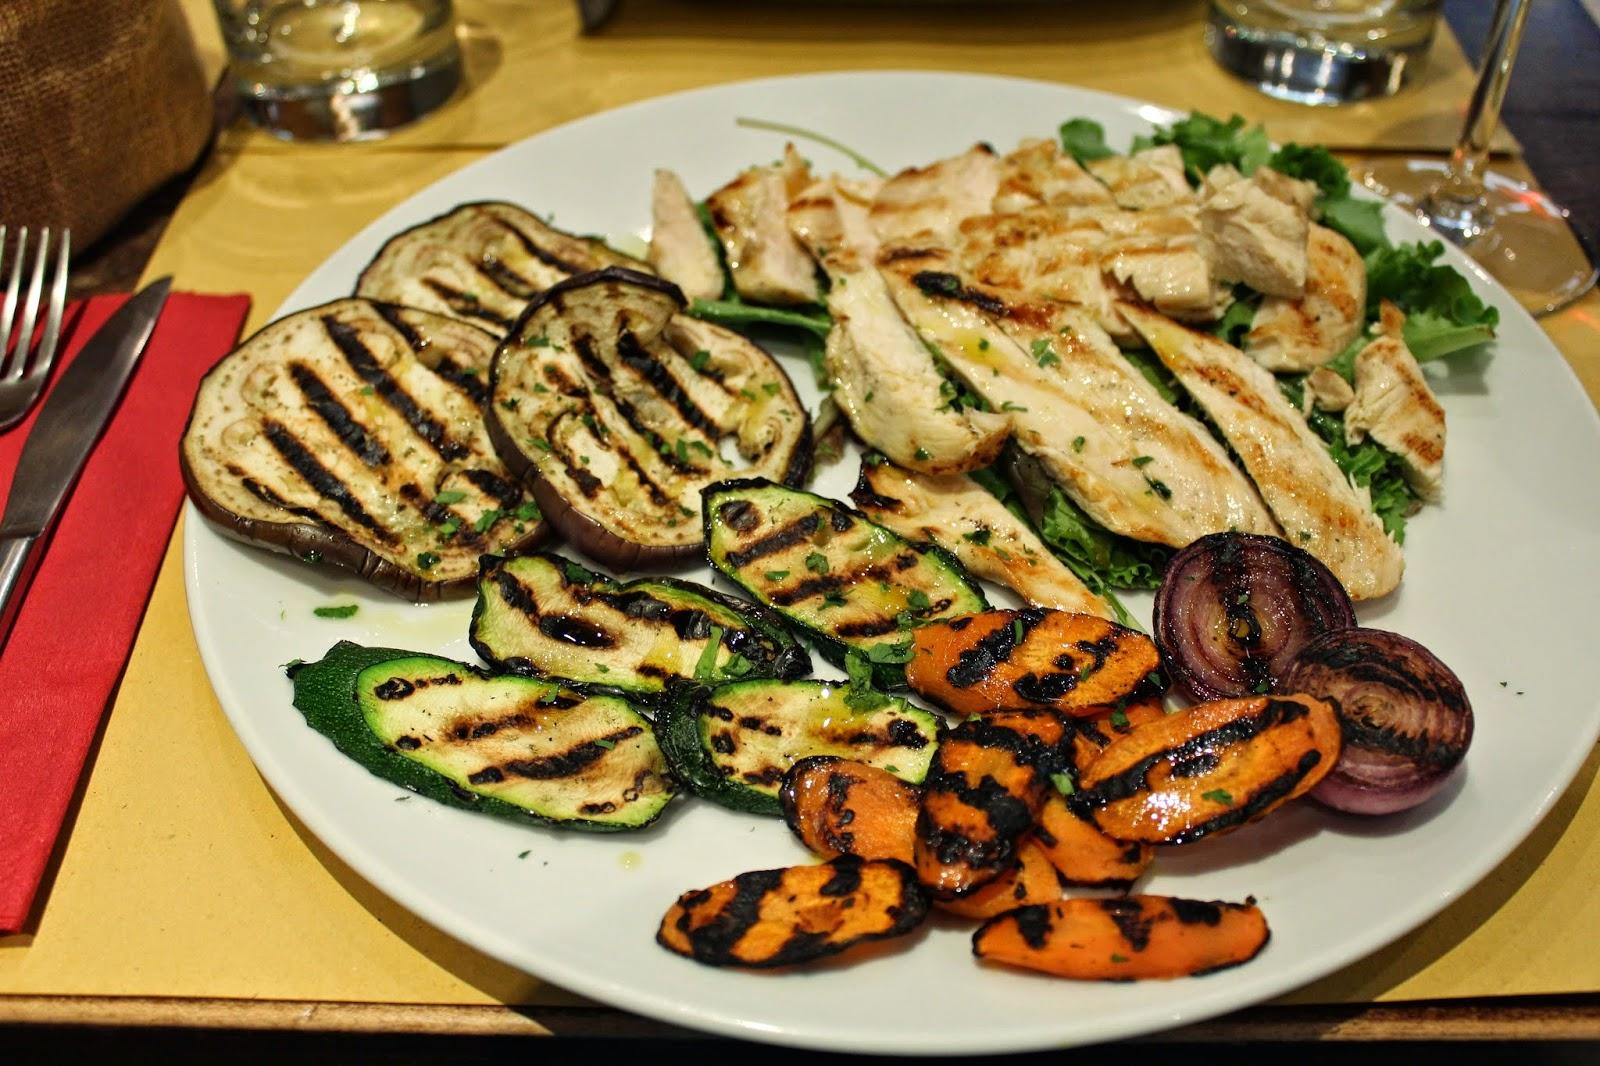 Grilled Veggies Italian style